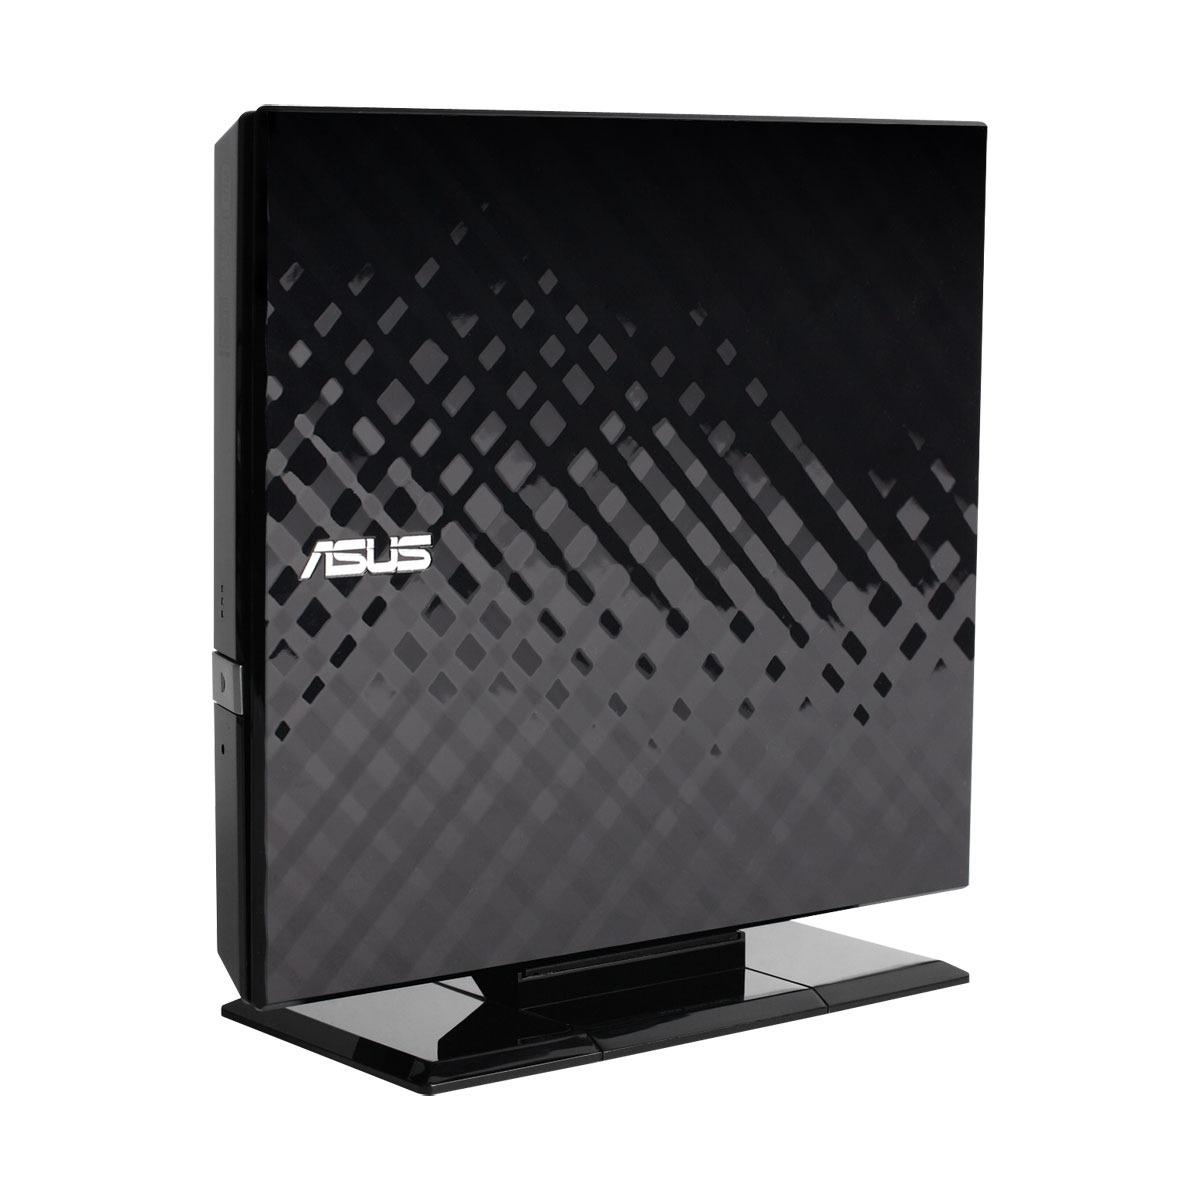 "LDLC.com ASUS Eee PC 1015PN Noir + Graveur DVD externe USB 2.0 Intel Atom Dual-Core N550 1 Go 250 Go 10.1"" LCD NVIDIA ION Graveur DVD externe Wi-Fi N/Bluetooth Webcam Windows 7 Starter"